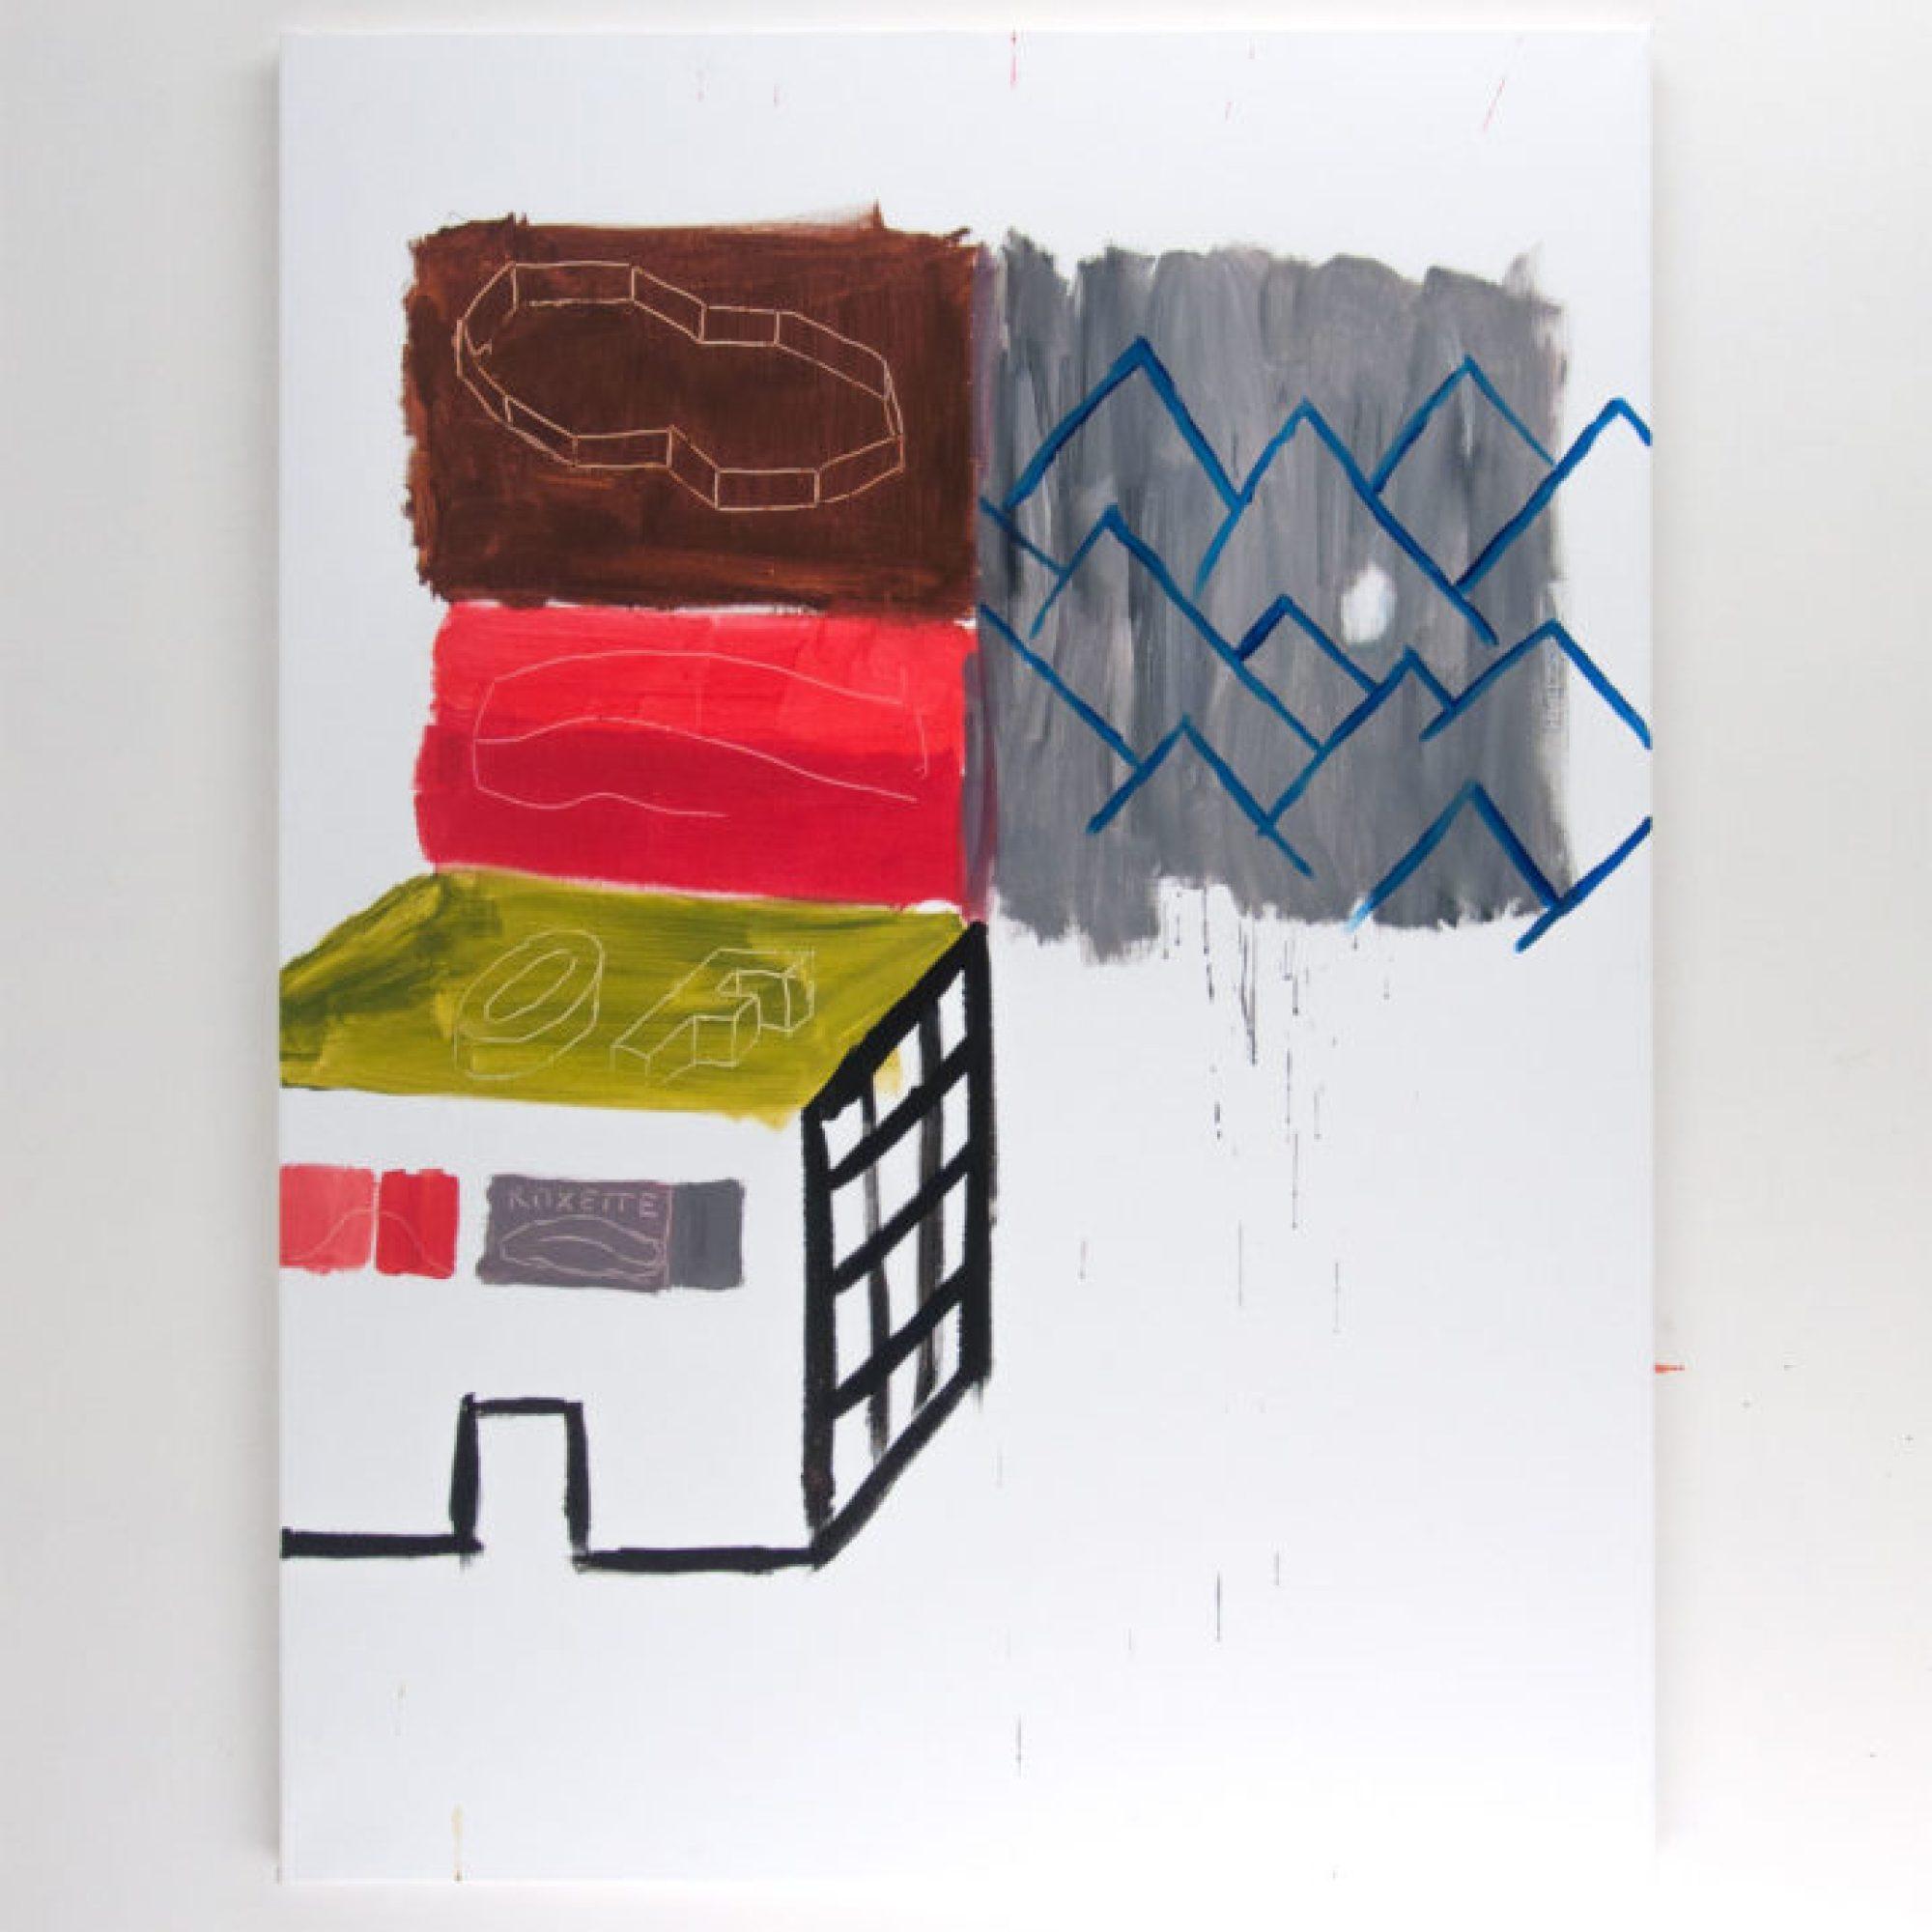 kazeta na hory / tape for mountain vacation, 115x155, akryl na plátně / acrylic on canvas, 2017